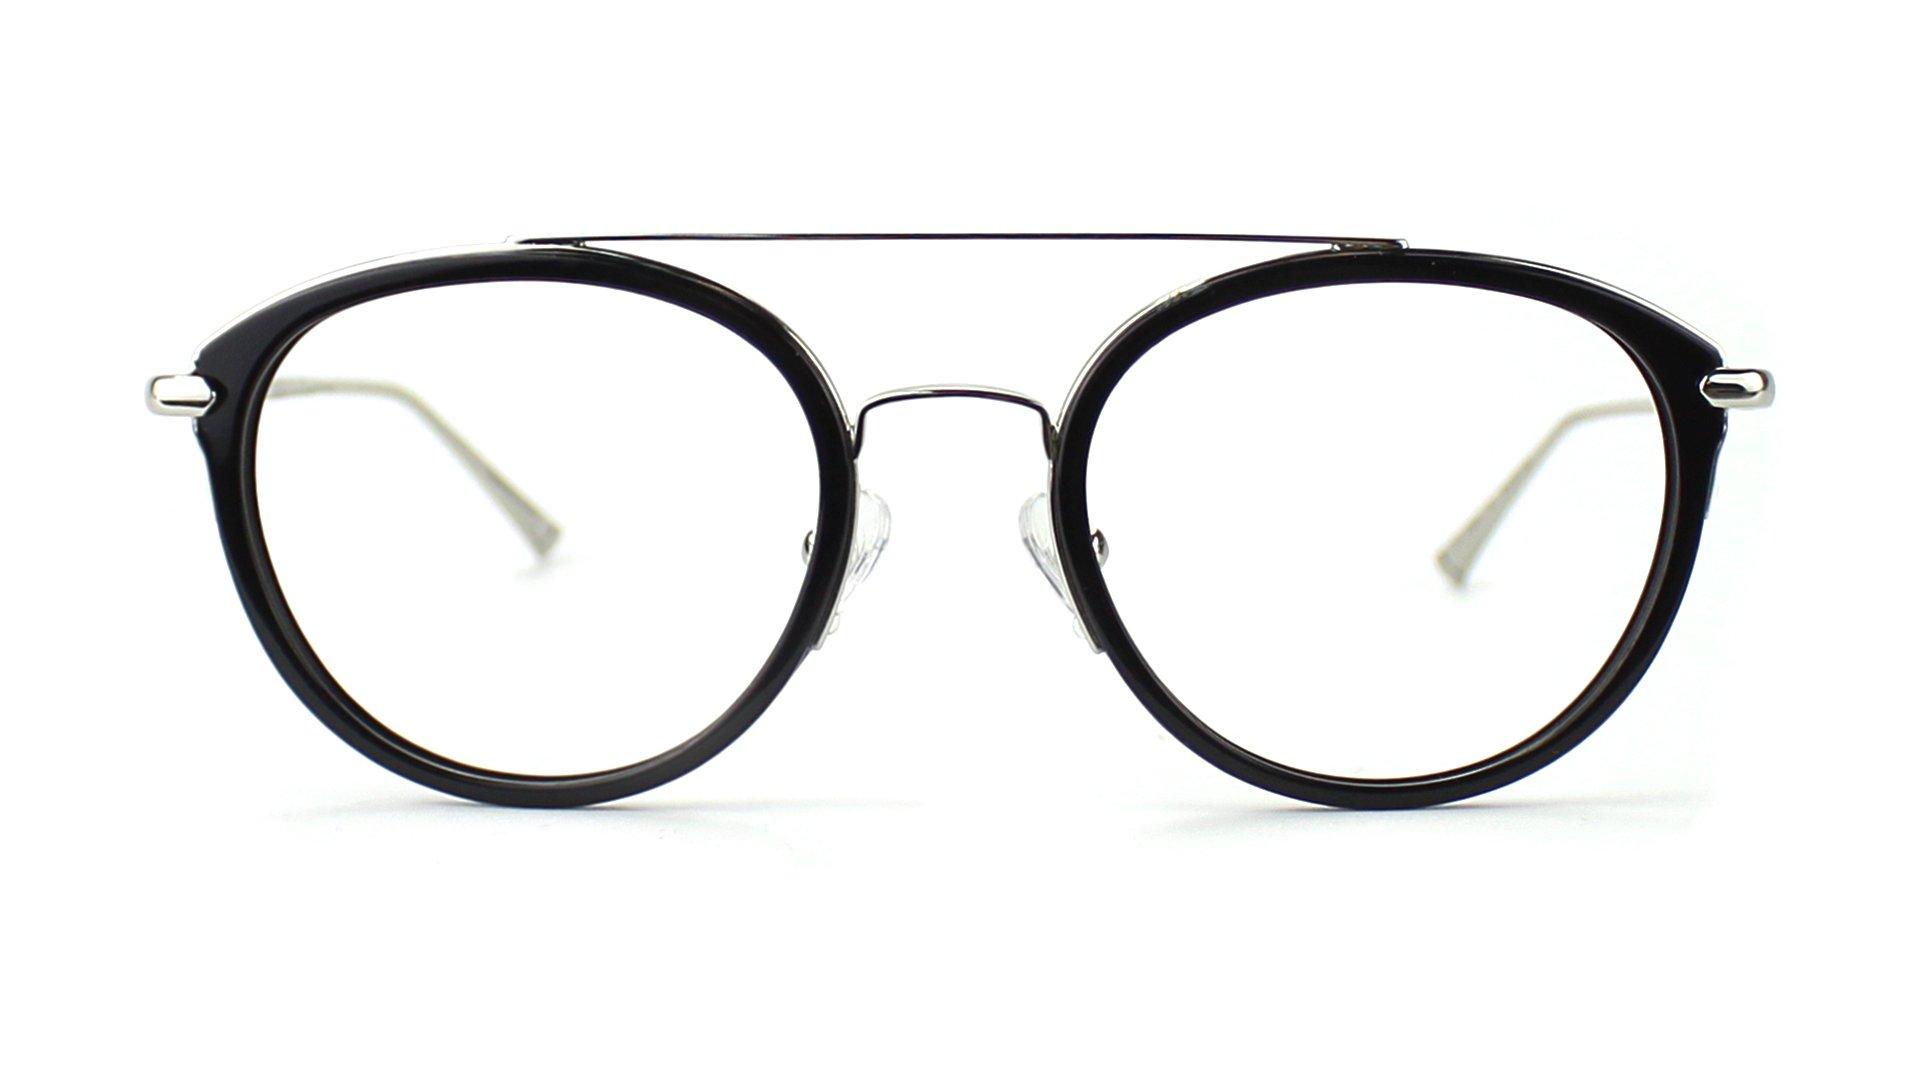 Taylor Morris SW14 C1 Optical, Non-prescription